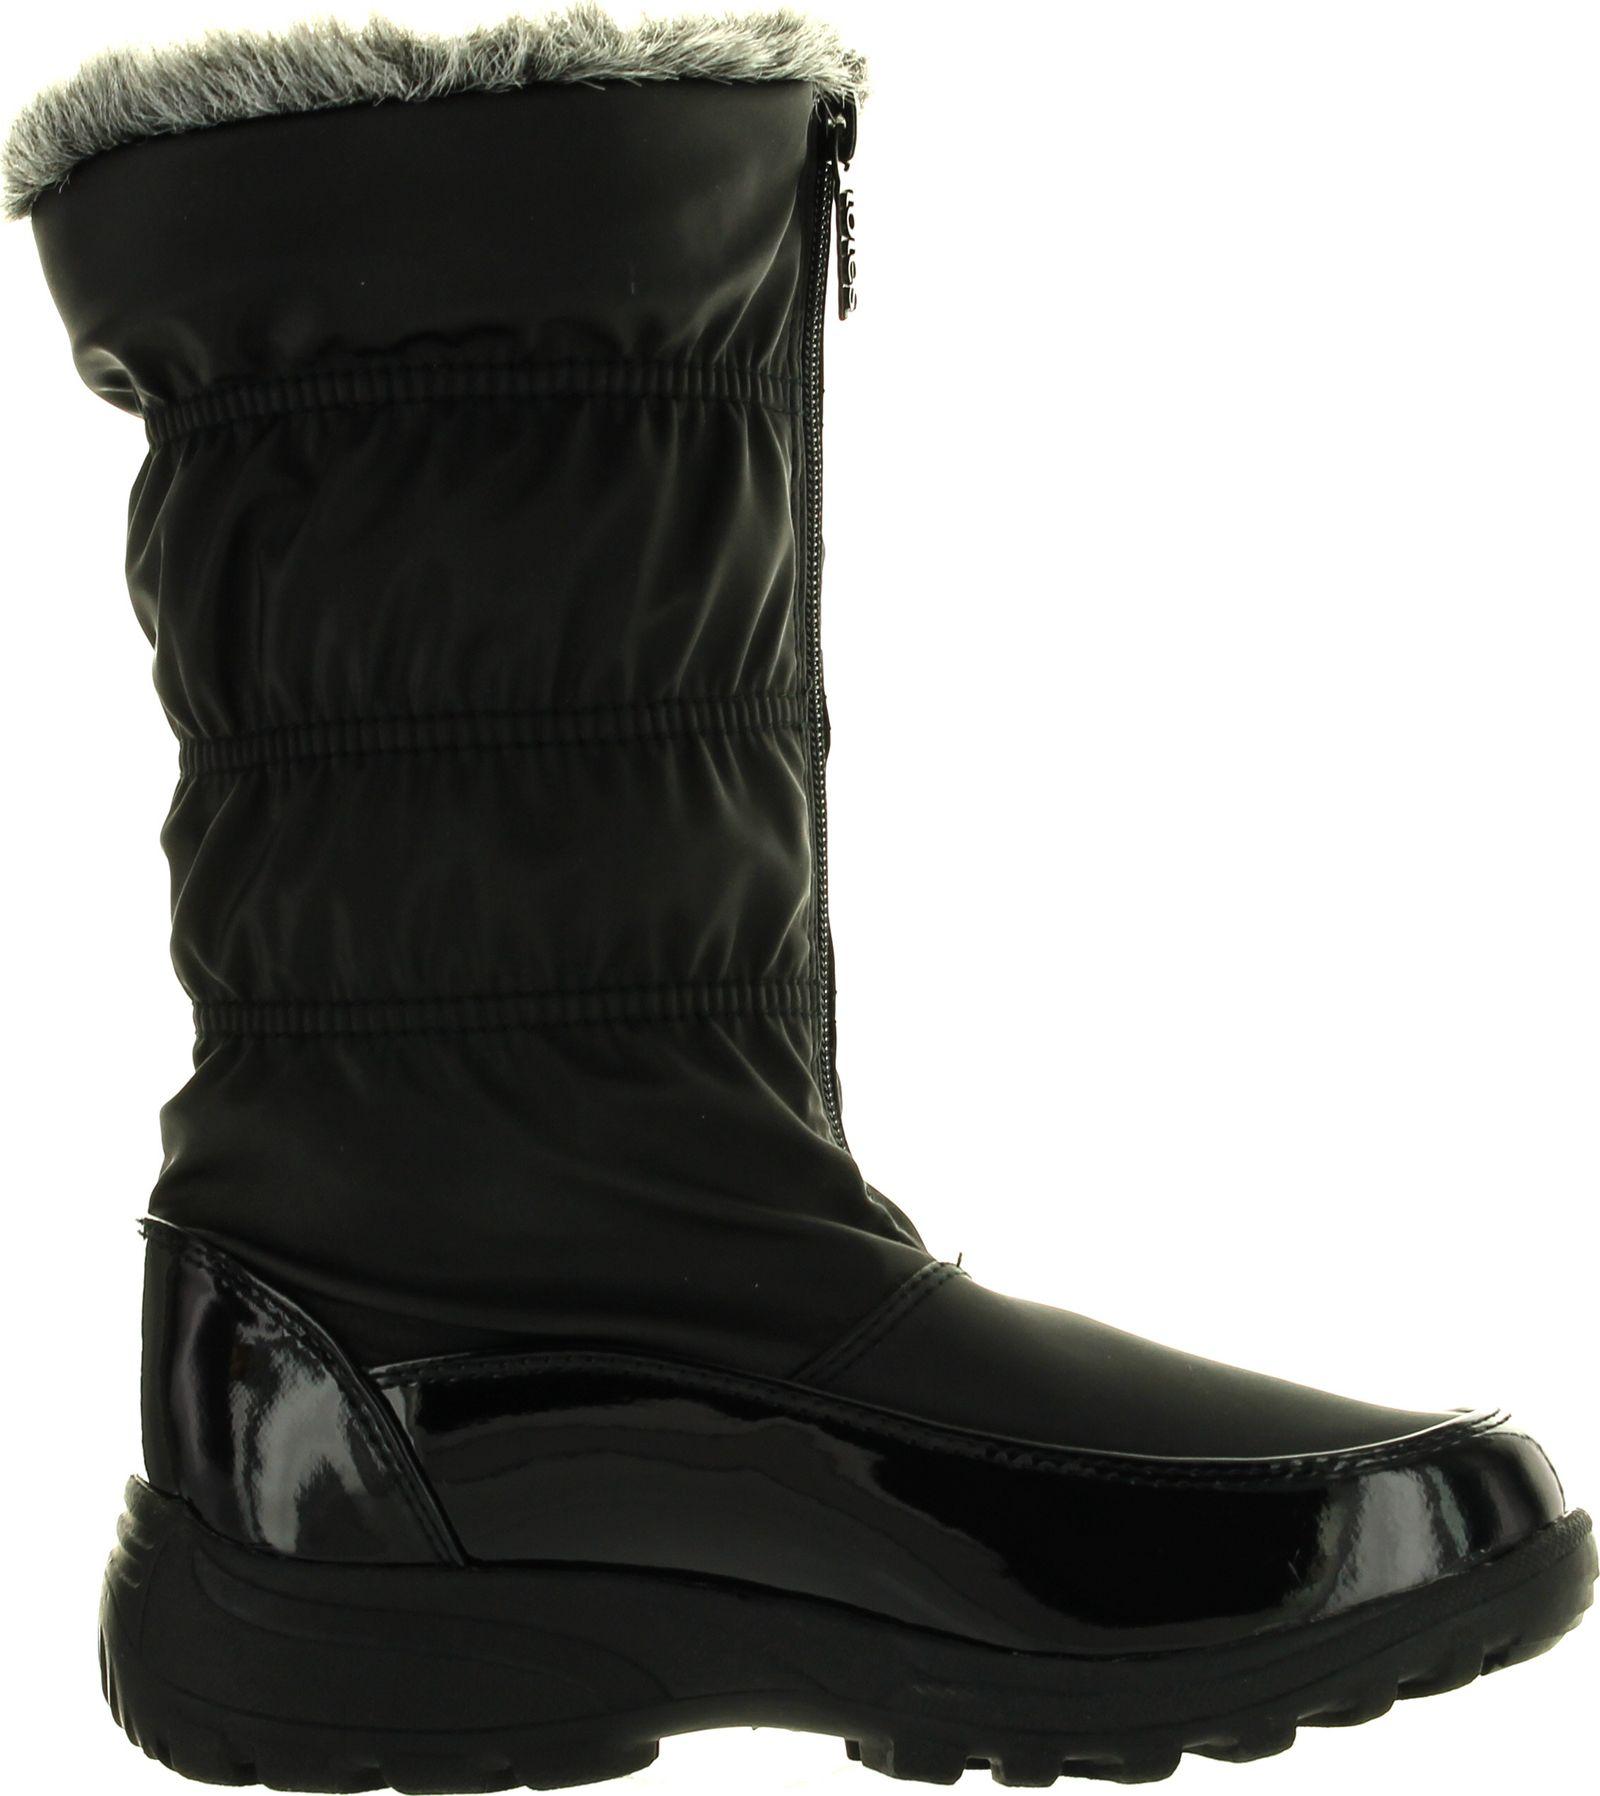 Totes Womens Rachel Winter Waterproof Snow Boots | eBay